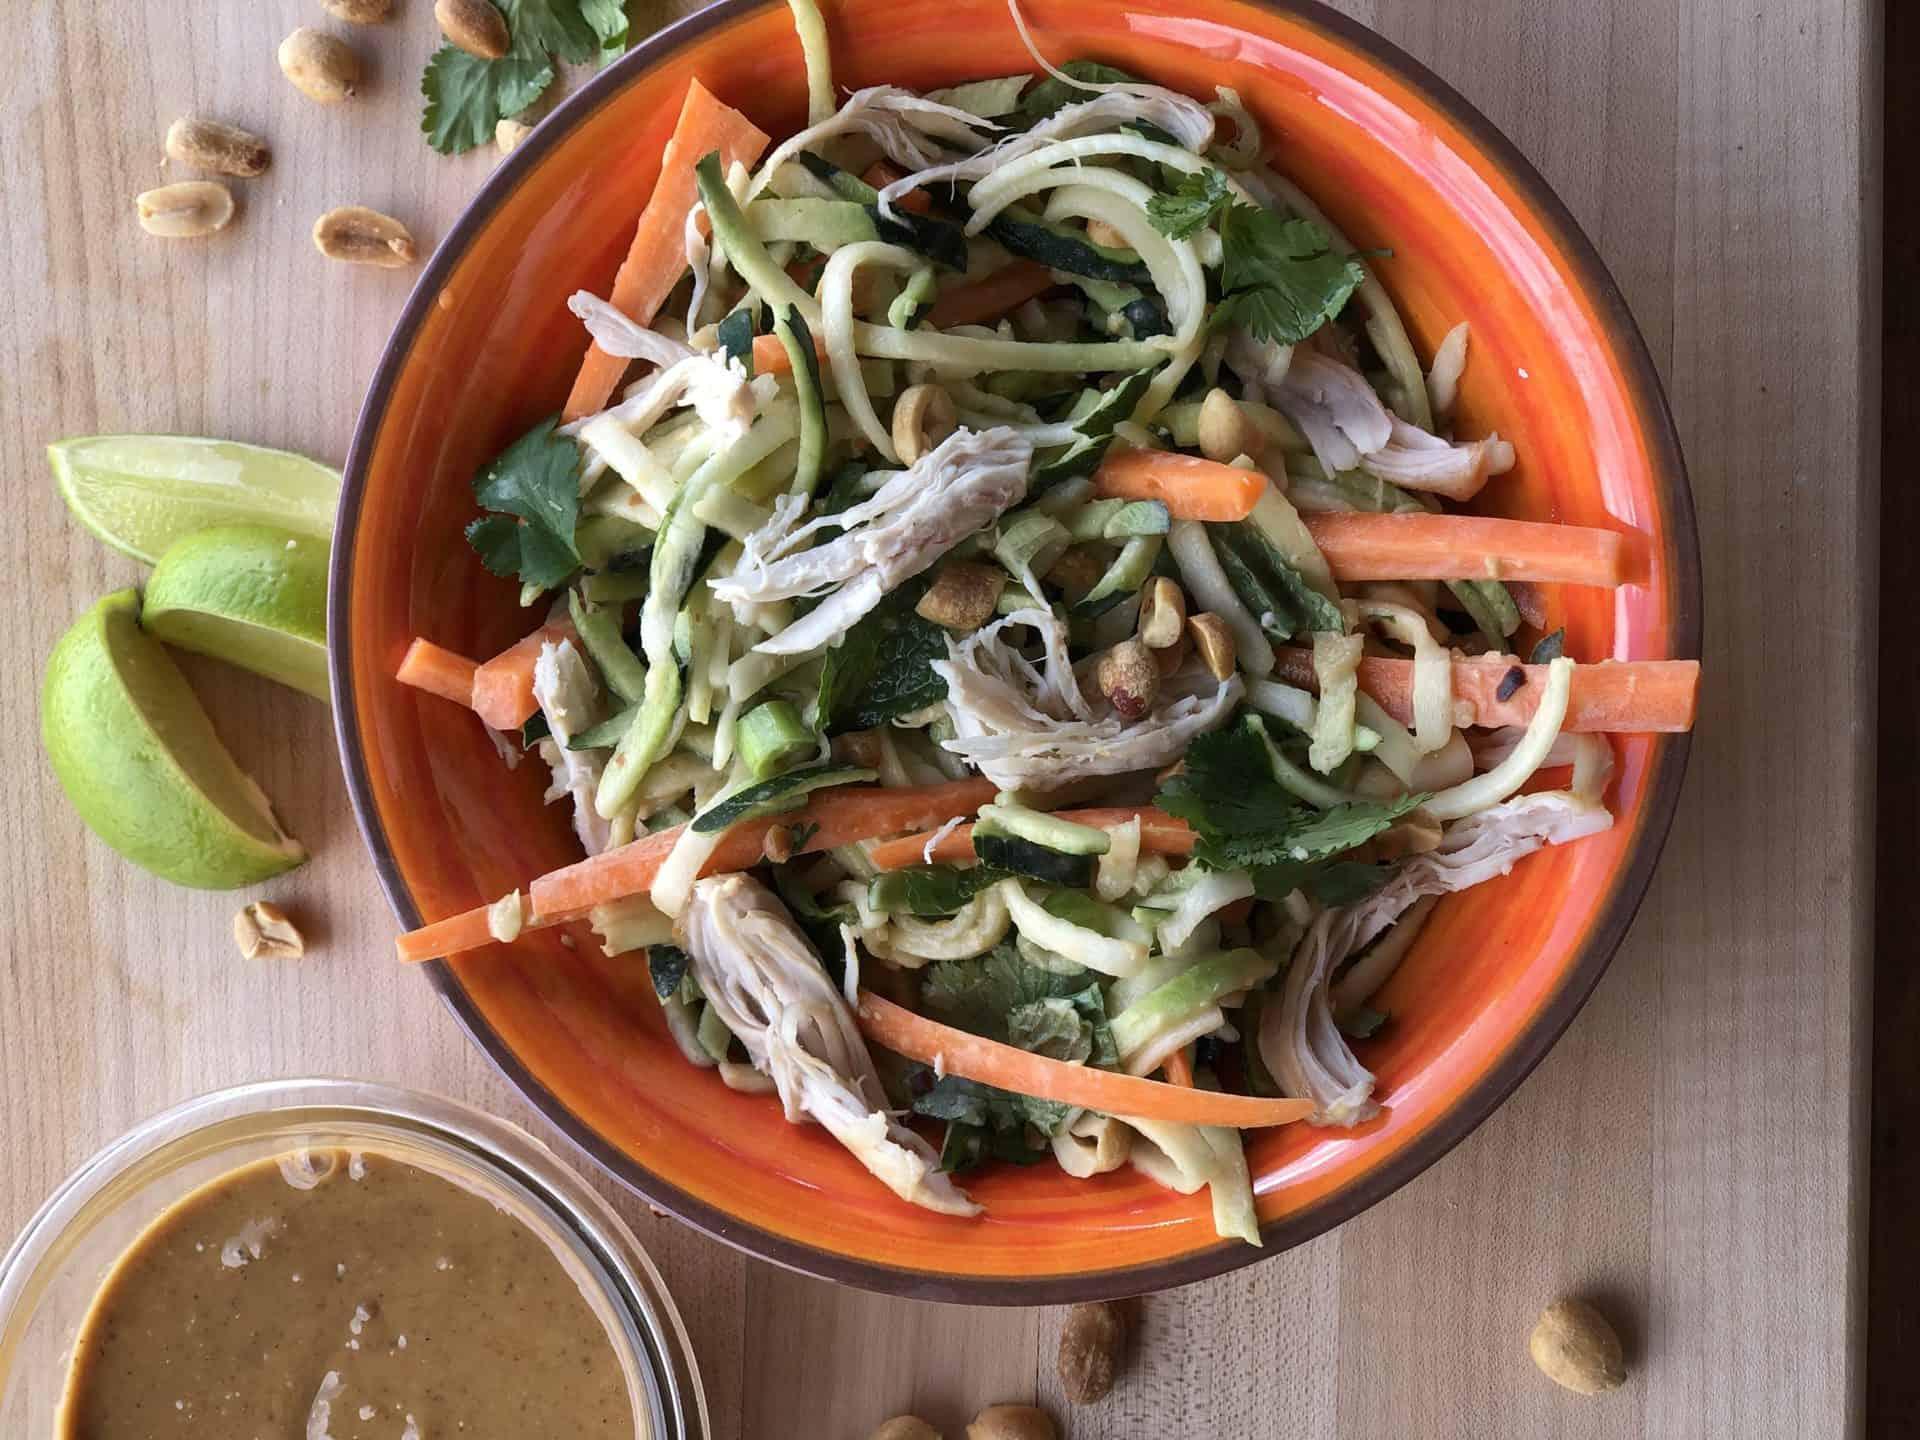 Salads, Dinner, Lunch, Chicken, Peanut Butter, Quick & Easy